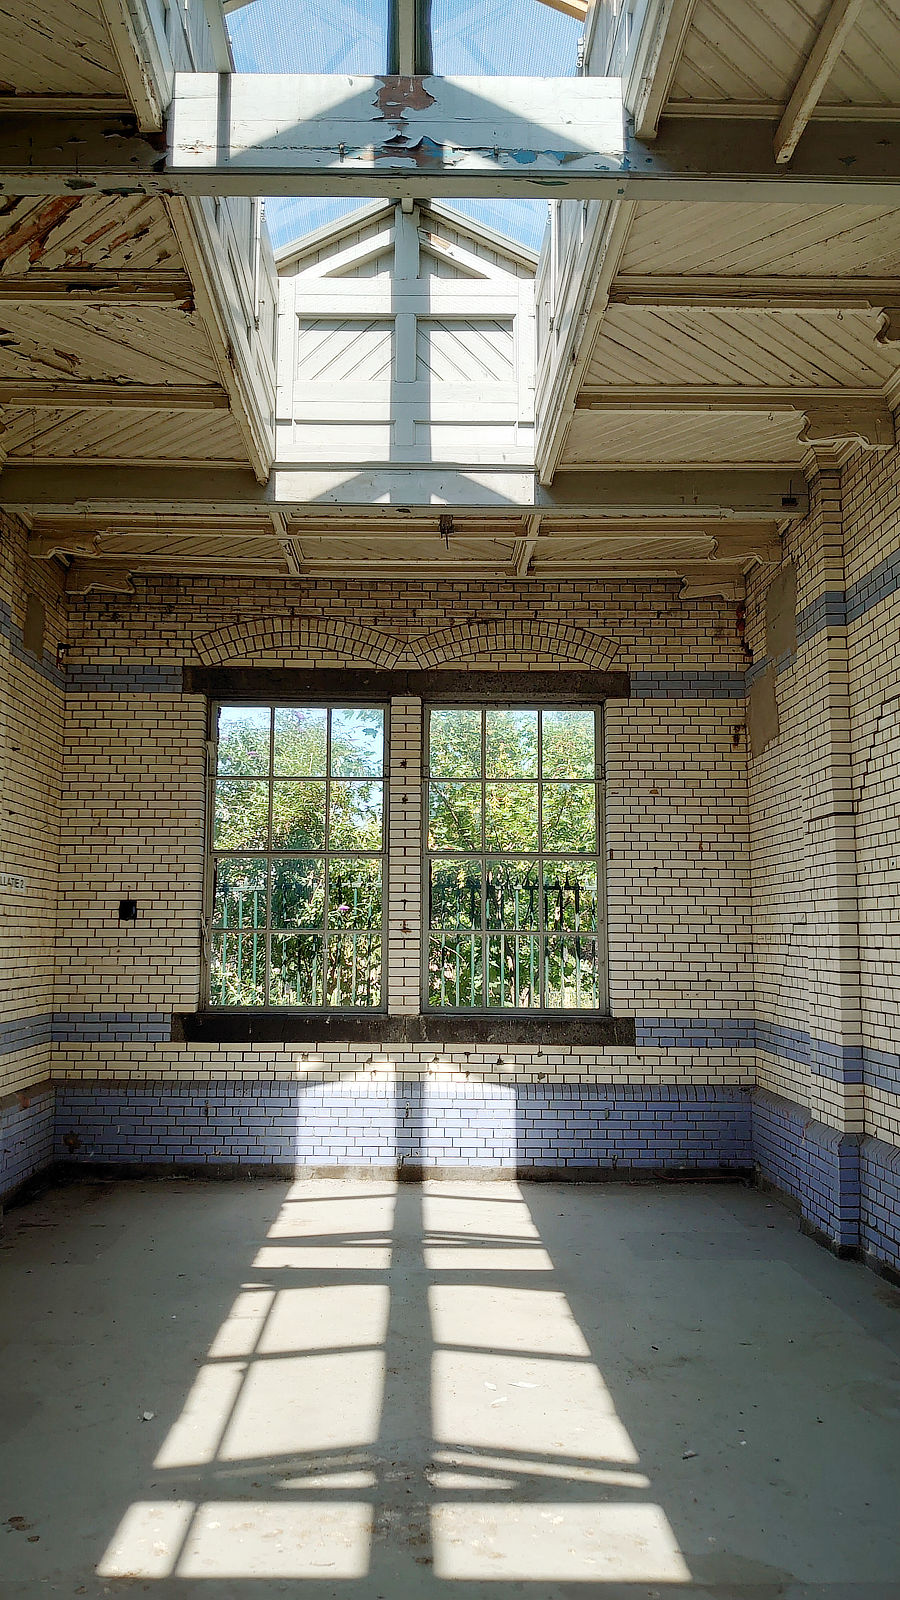 De Machinekamer Watergasfabriek Leiden